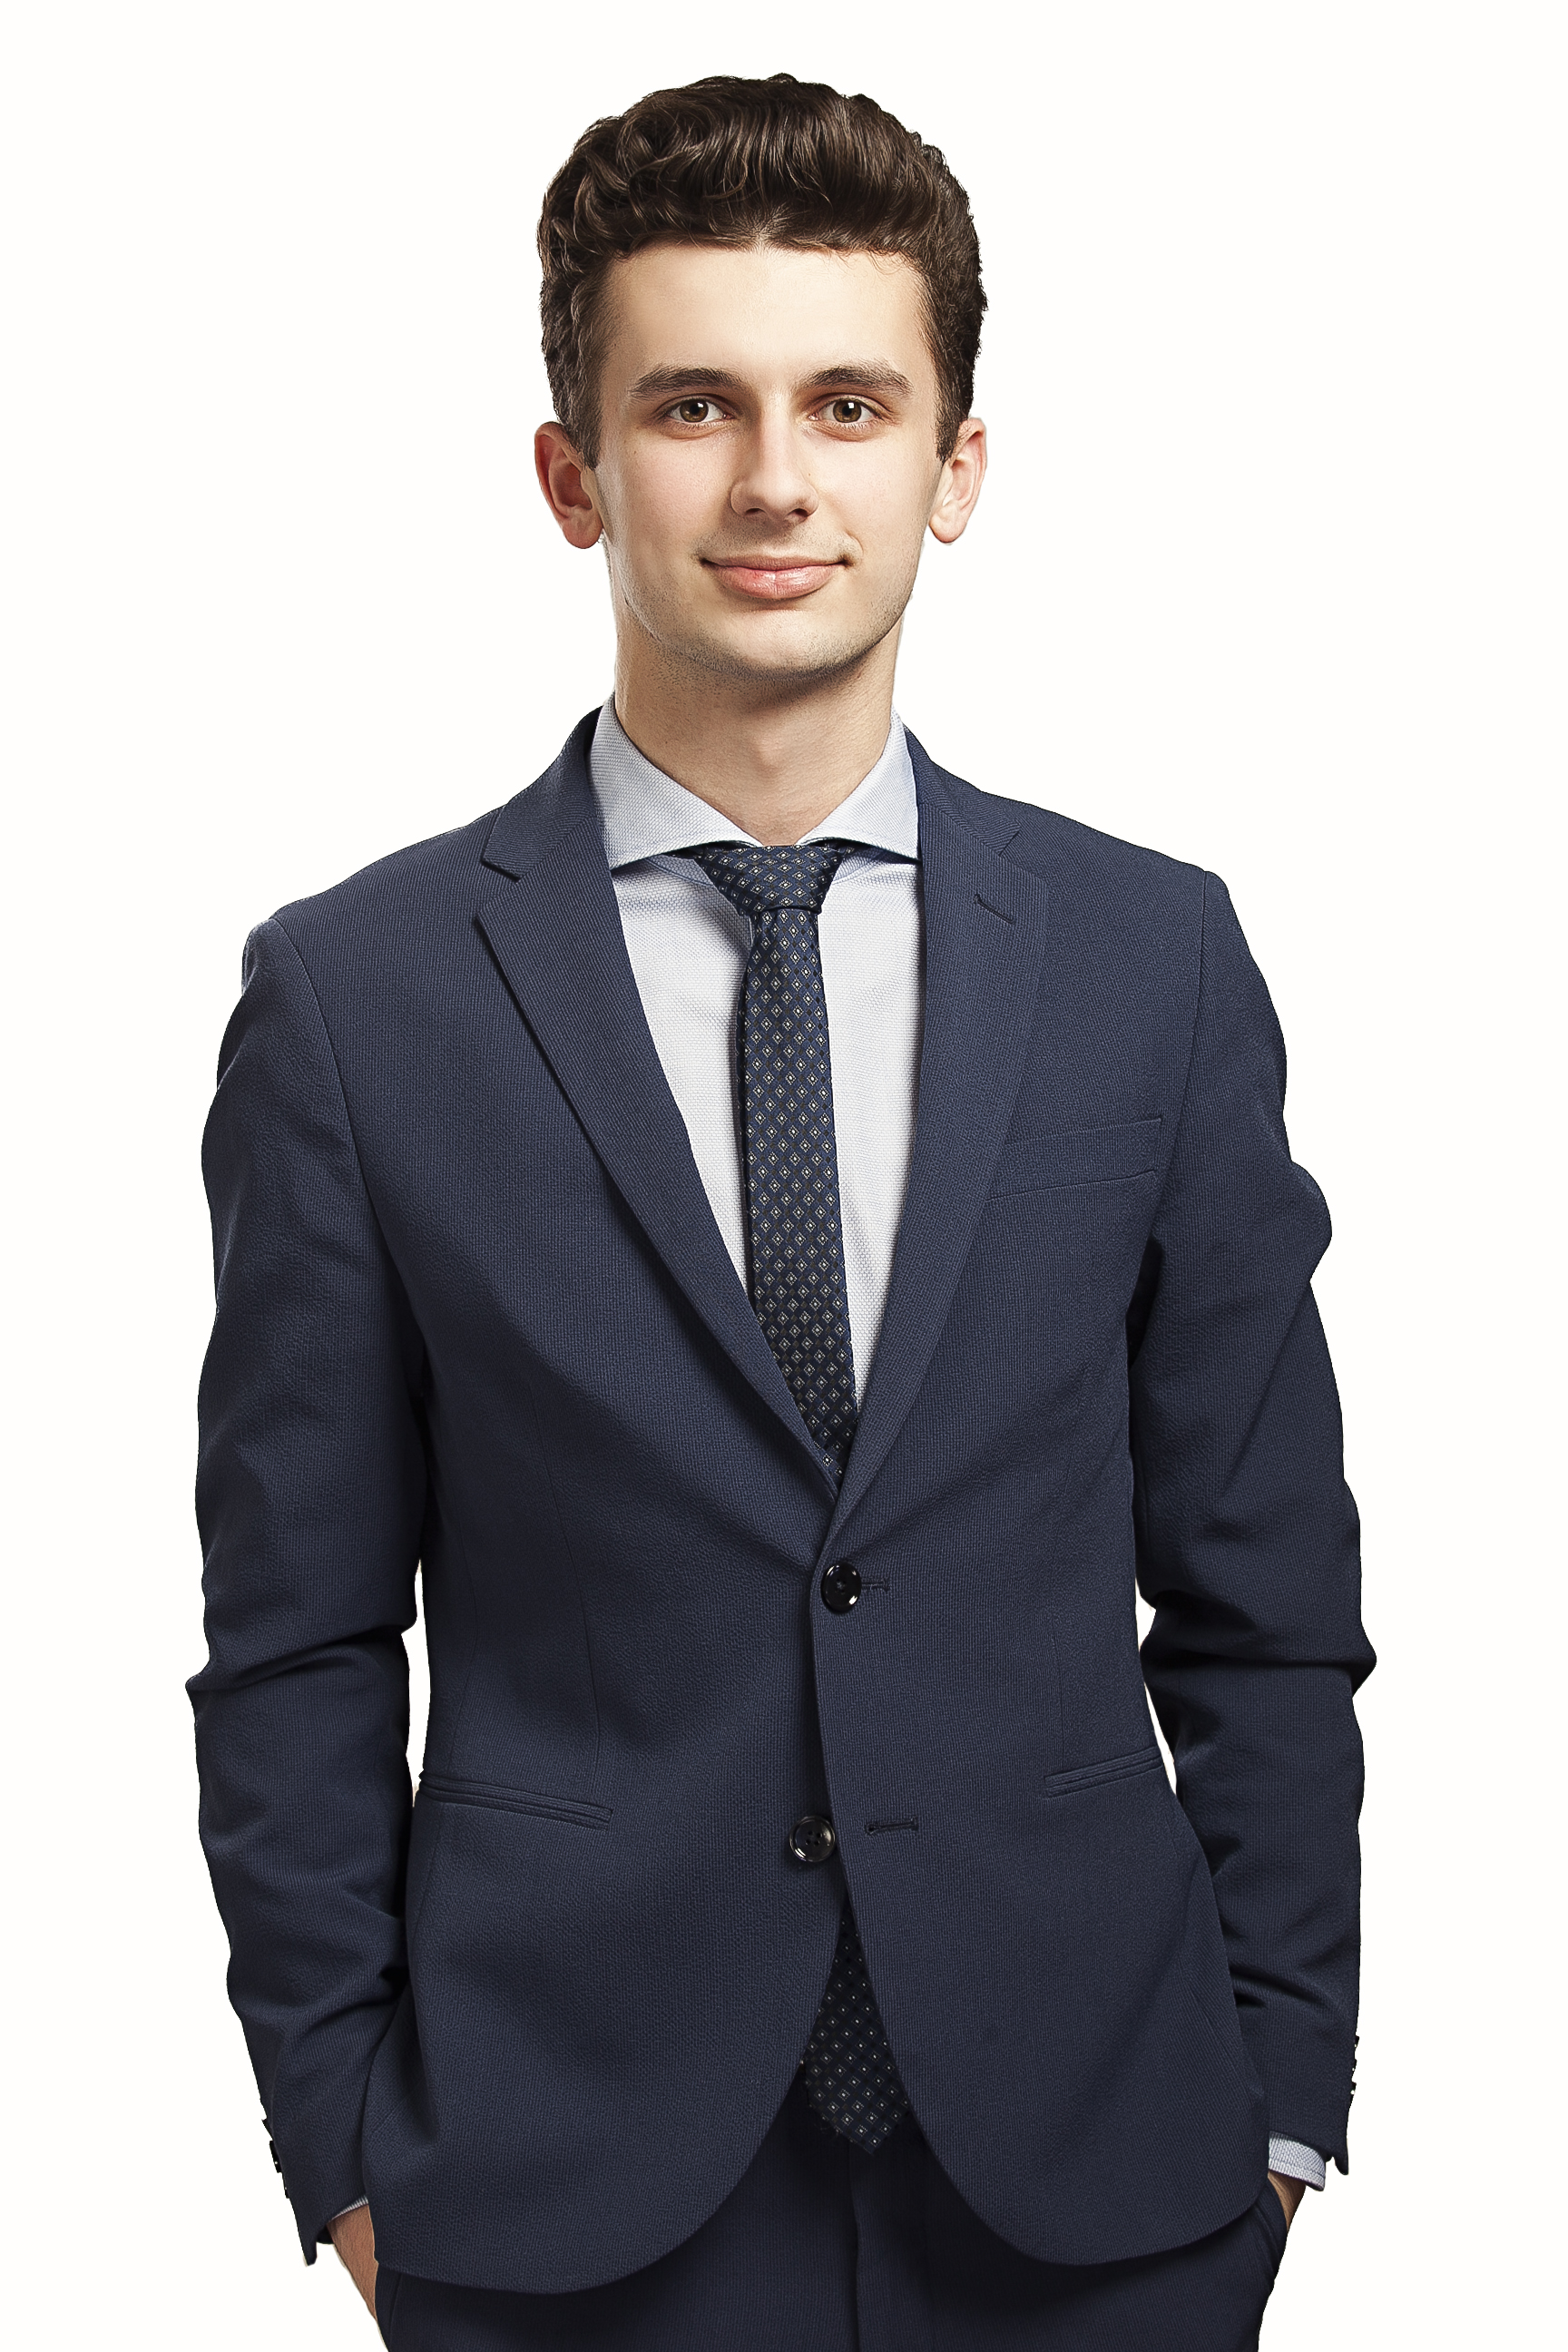 Олесь Трачук